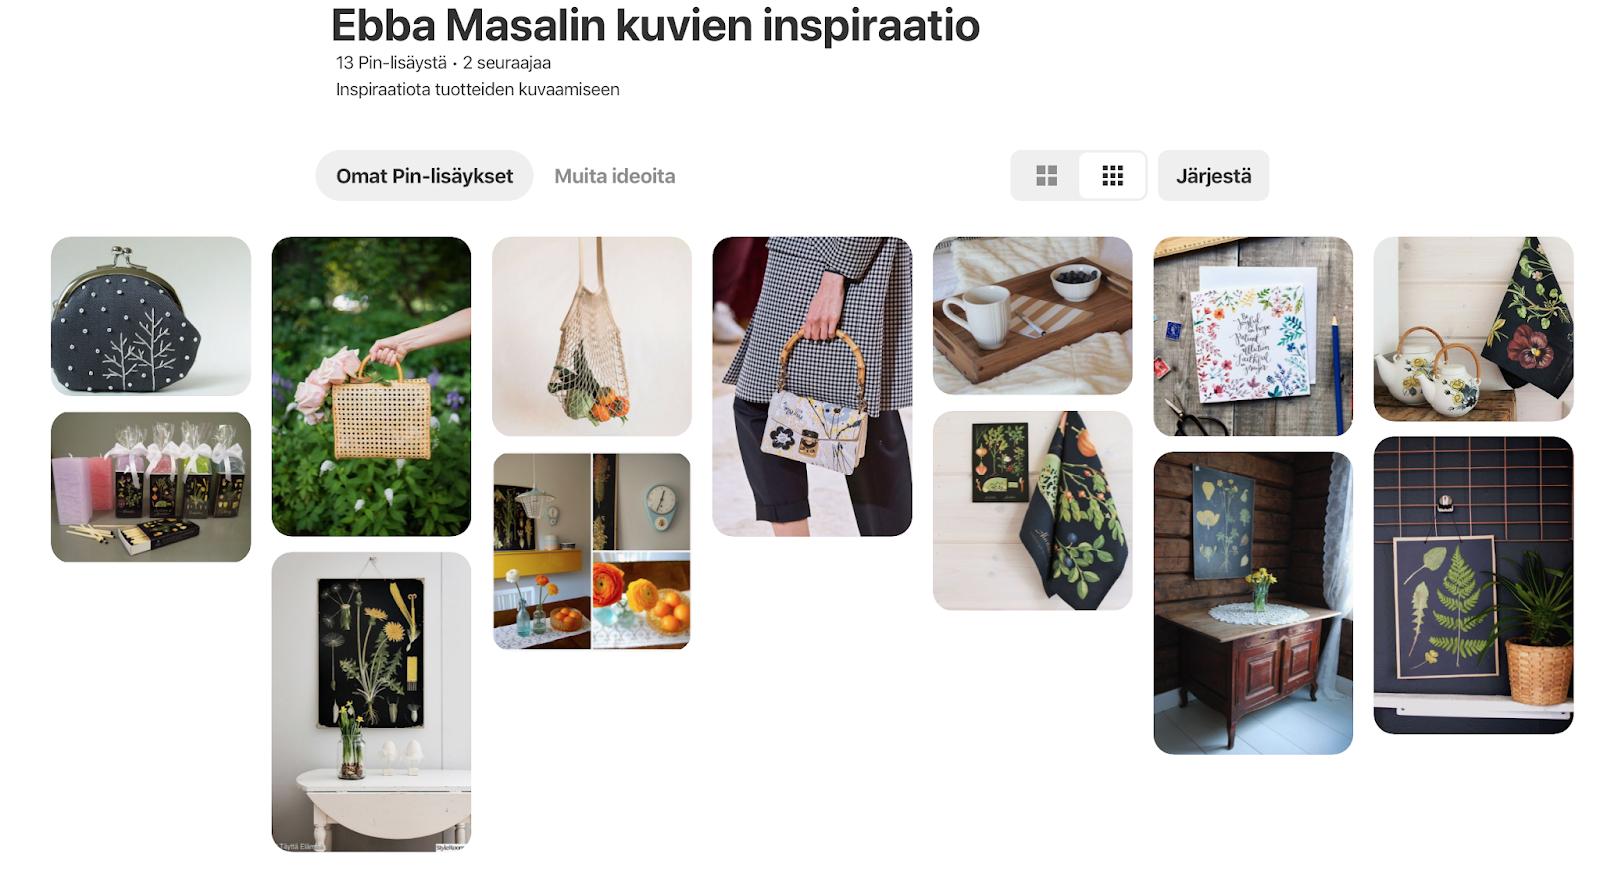 ebba masalin pinterest taulu inspiraatio